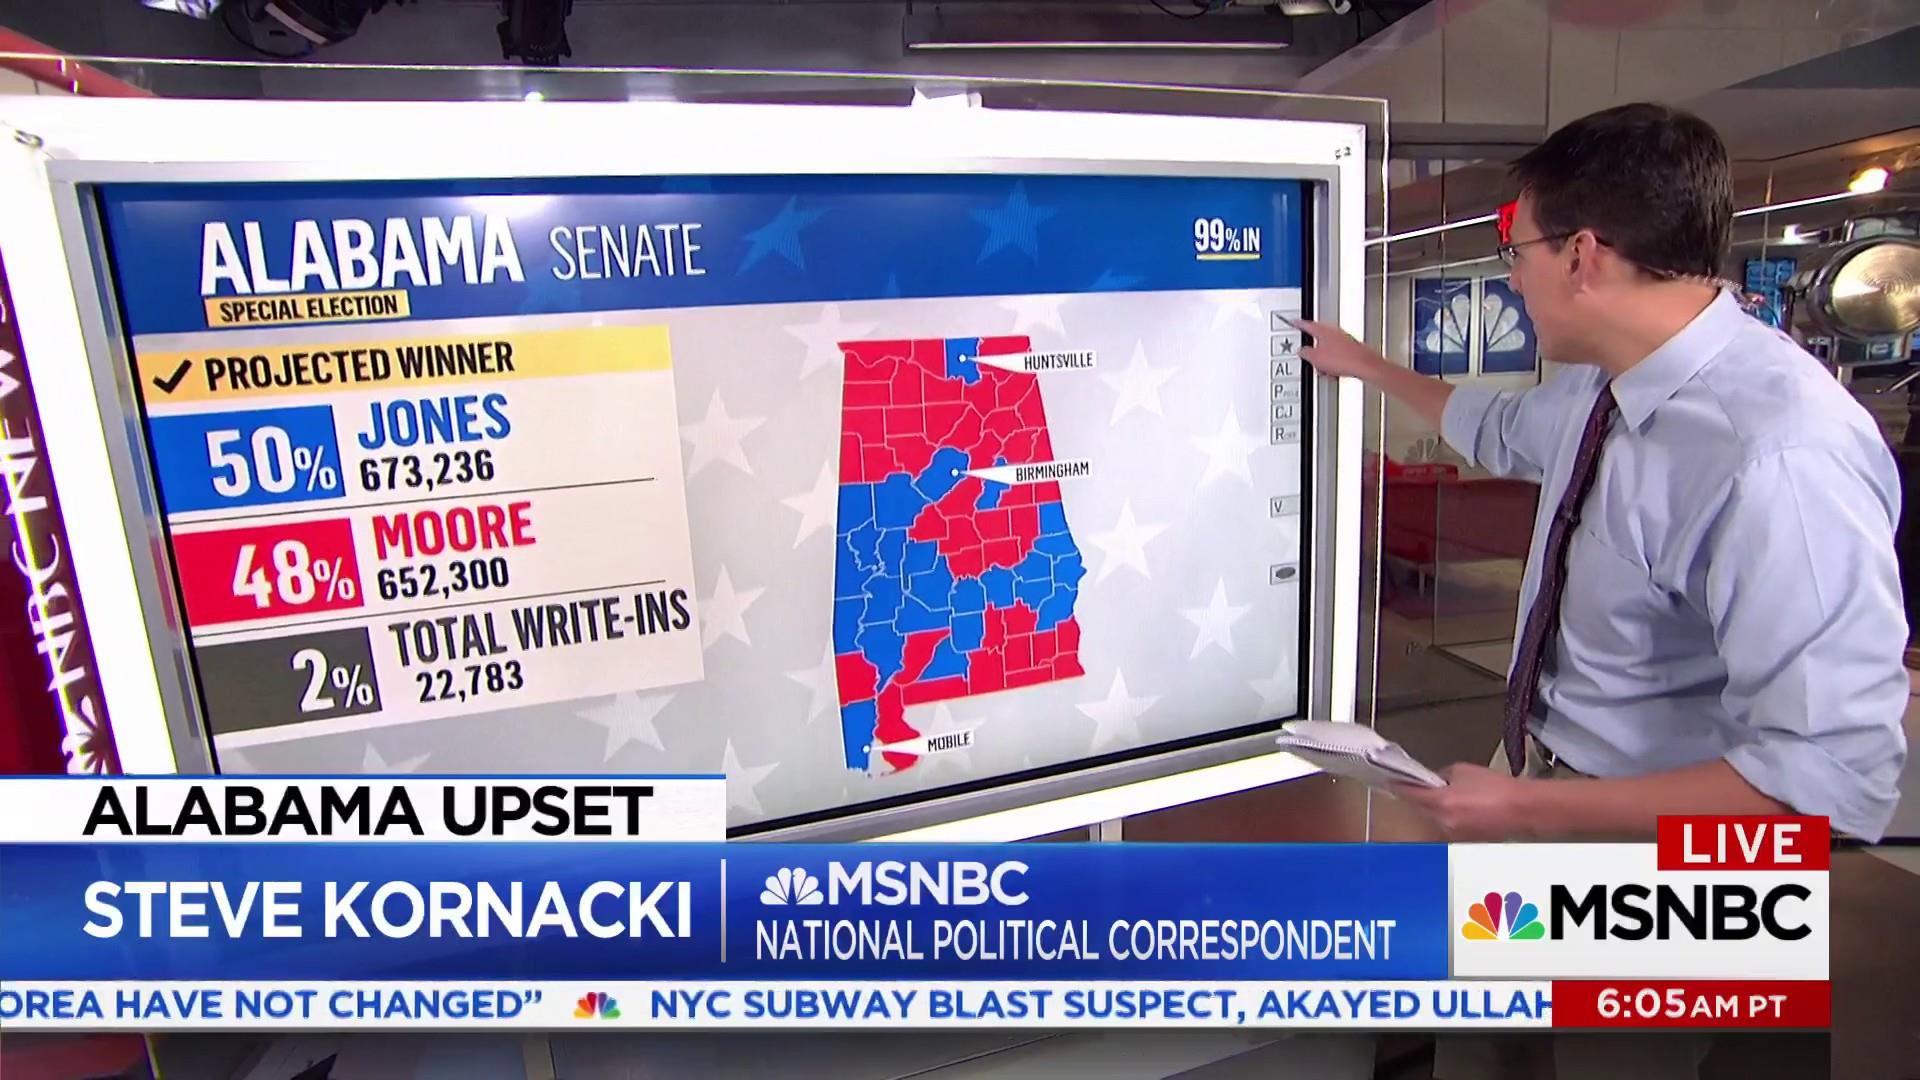 Kornacki: These key districts lead to Jones' win